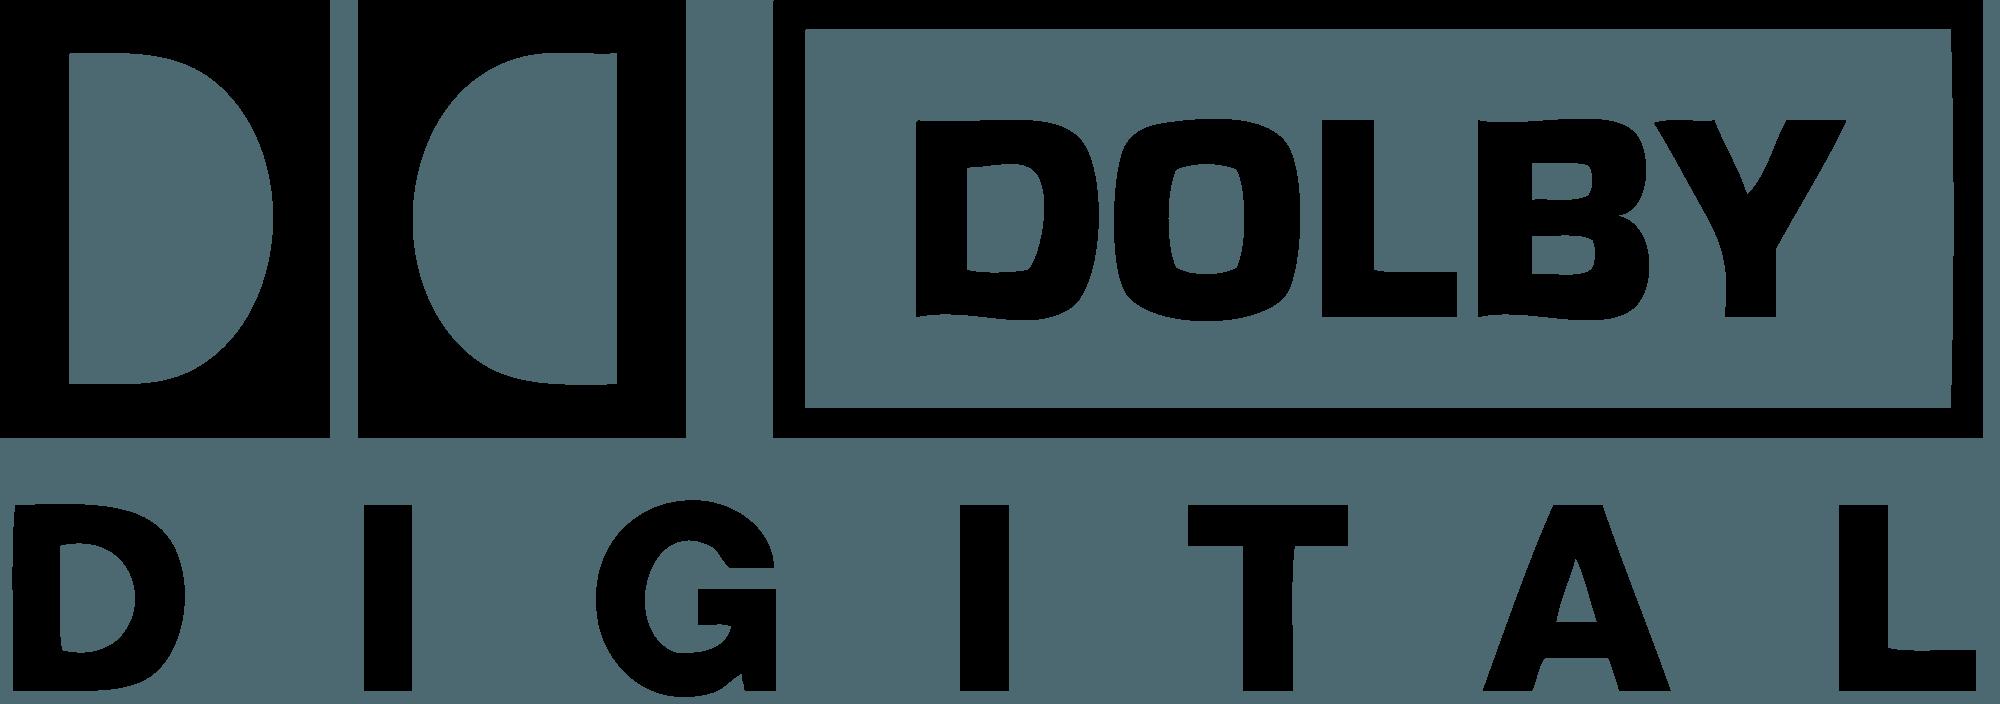 Dolby digital logo clipart clip royalty free stock Dolby Digital Logo - LogoDix clip royalty free stock